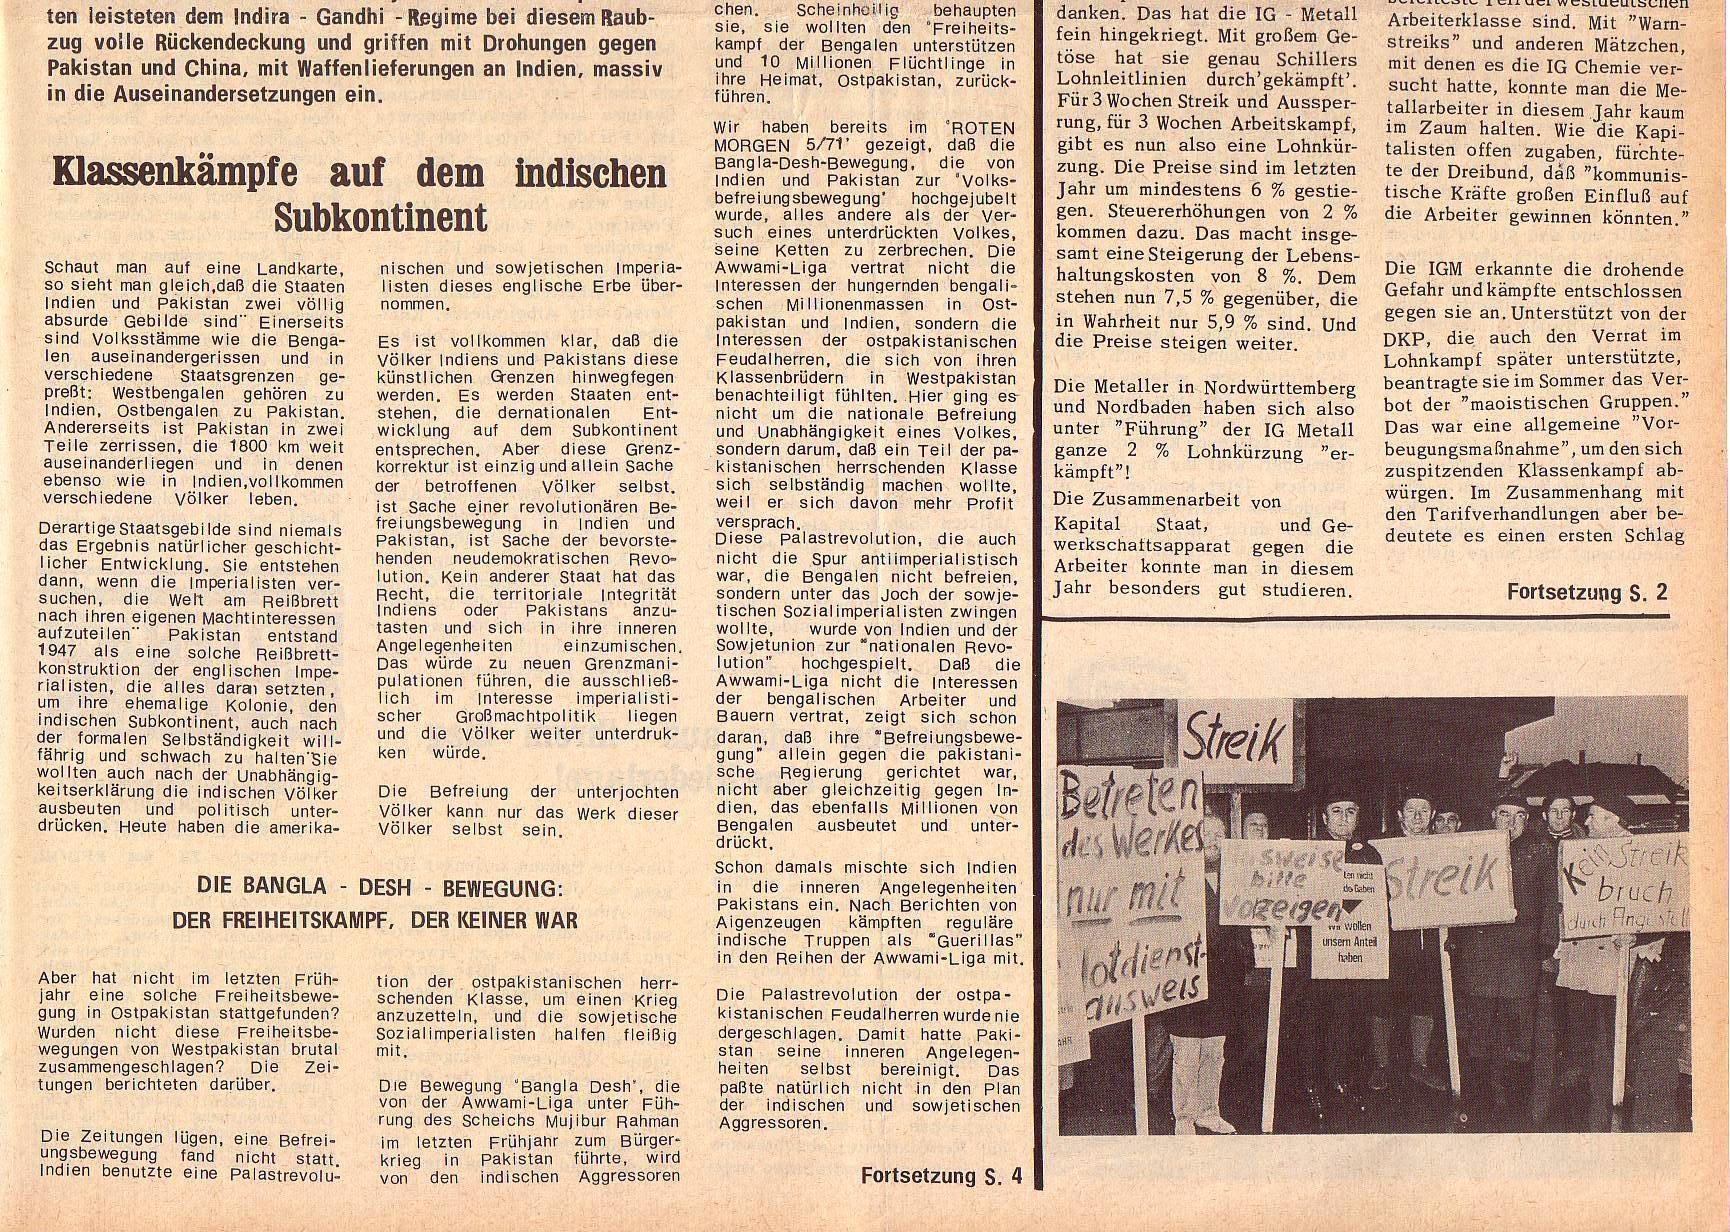 Roter Morgen, 5. Jg., 27. Dezember 1971, Nr. 16, Seite 1b